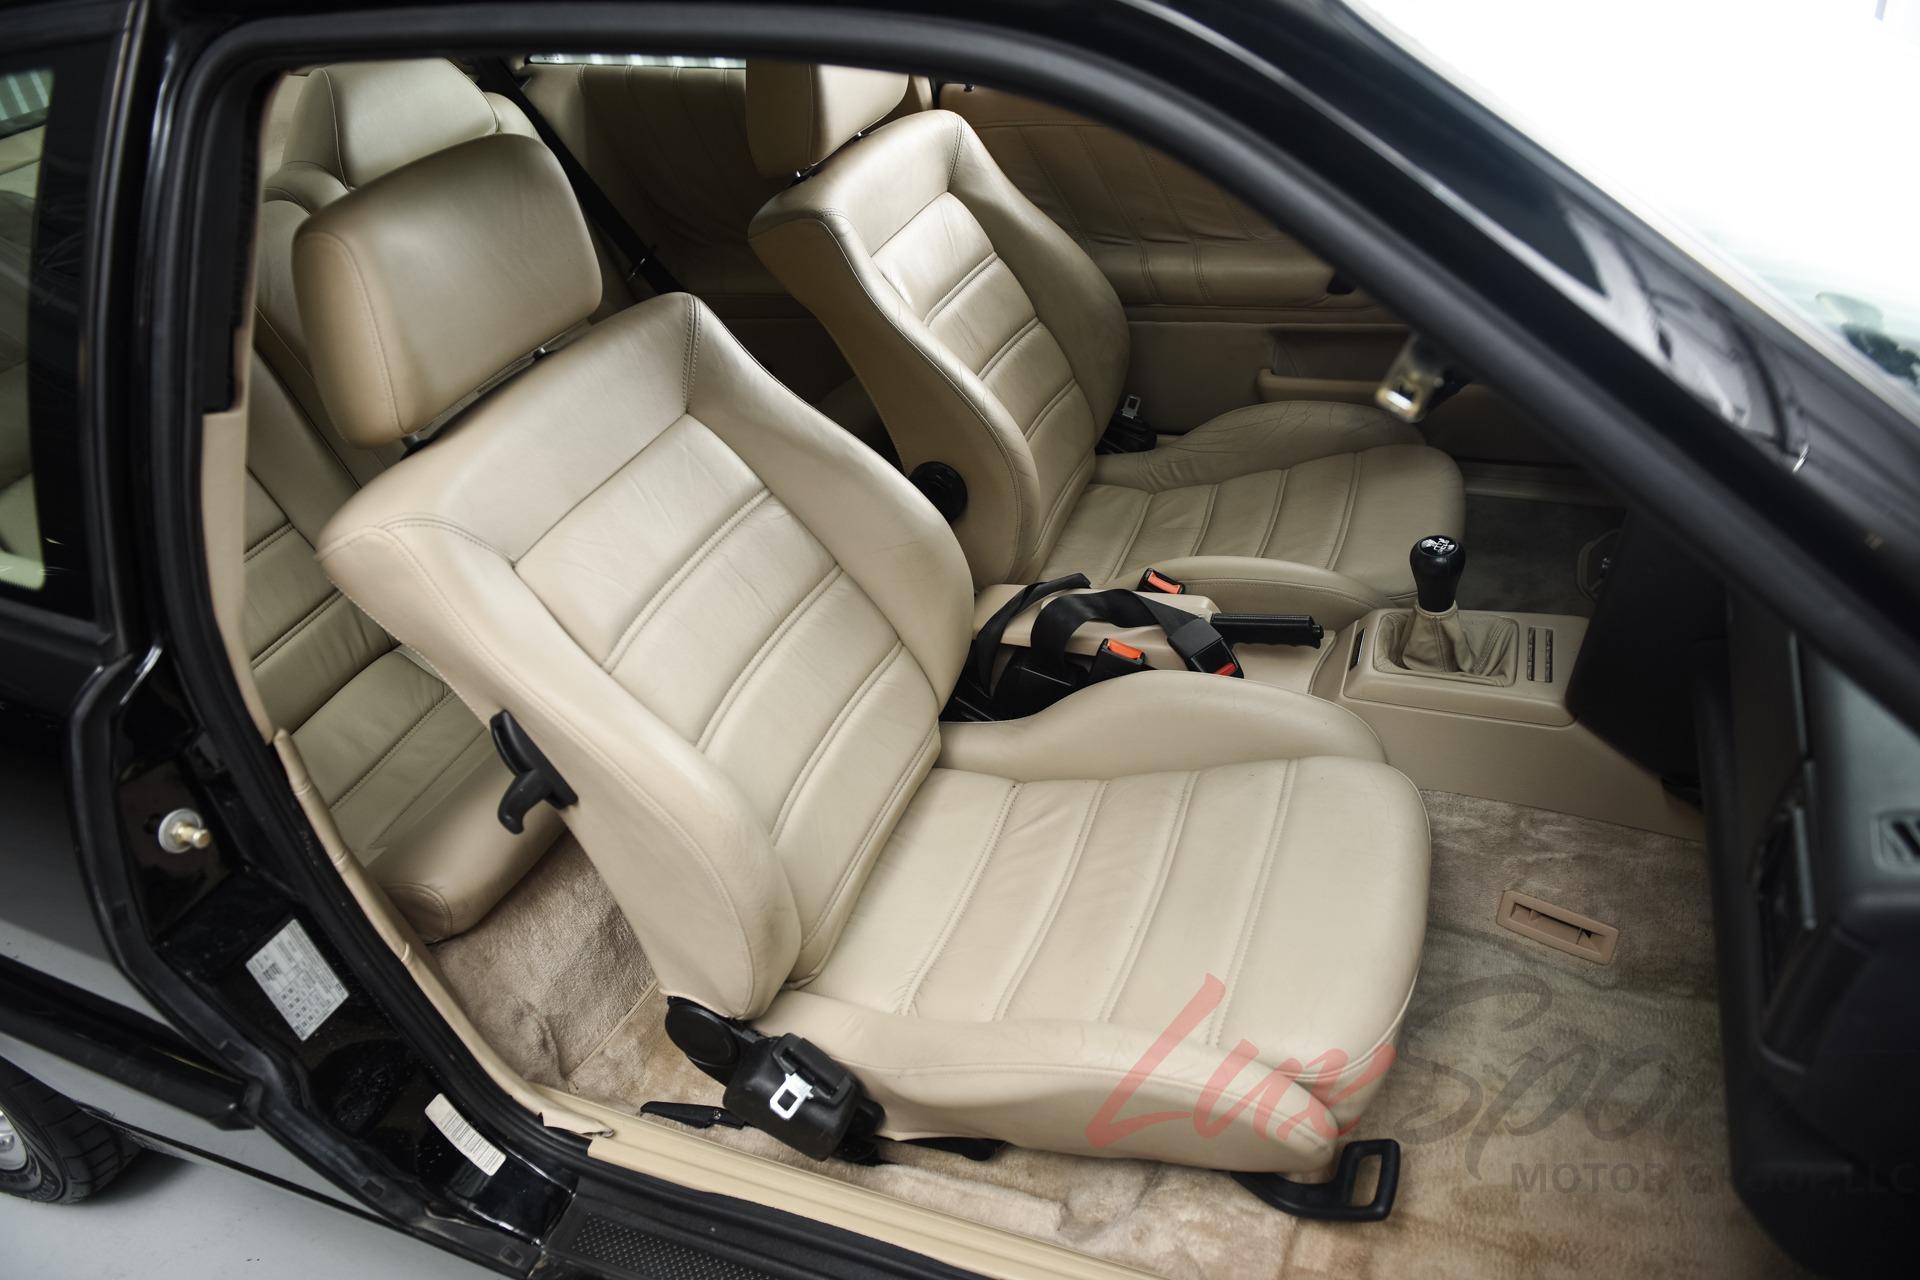 Used 1992 Volkswagen Corrado SLC VR6  | New Hyde Park, NY